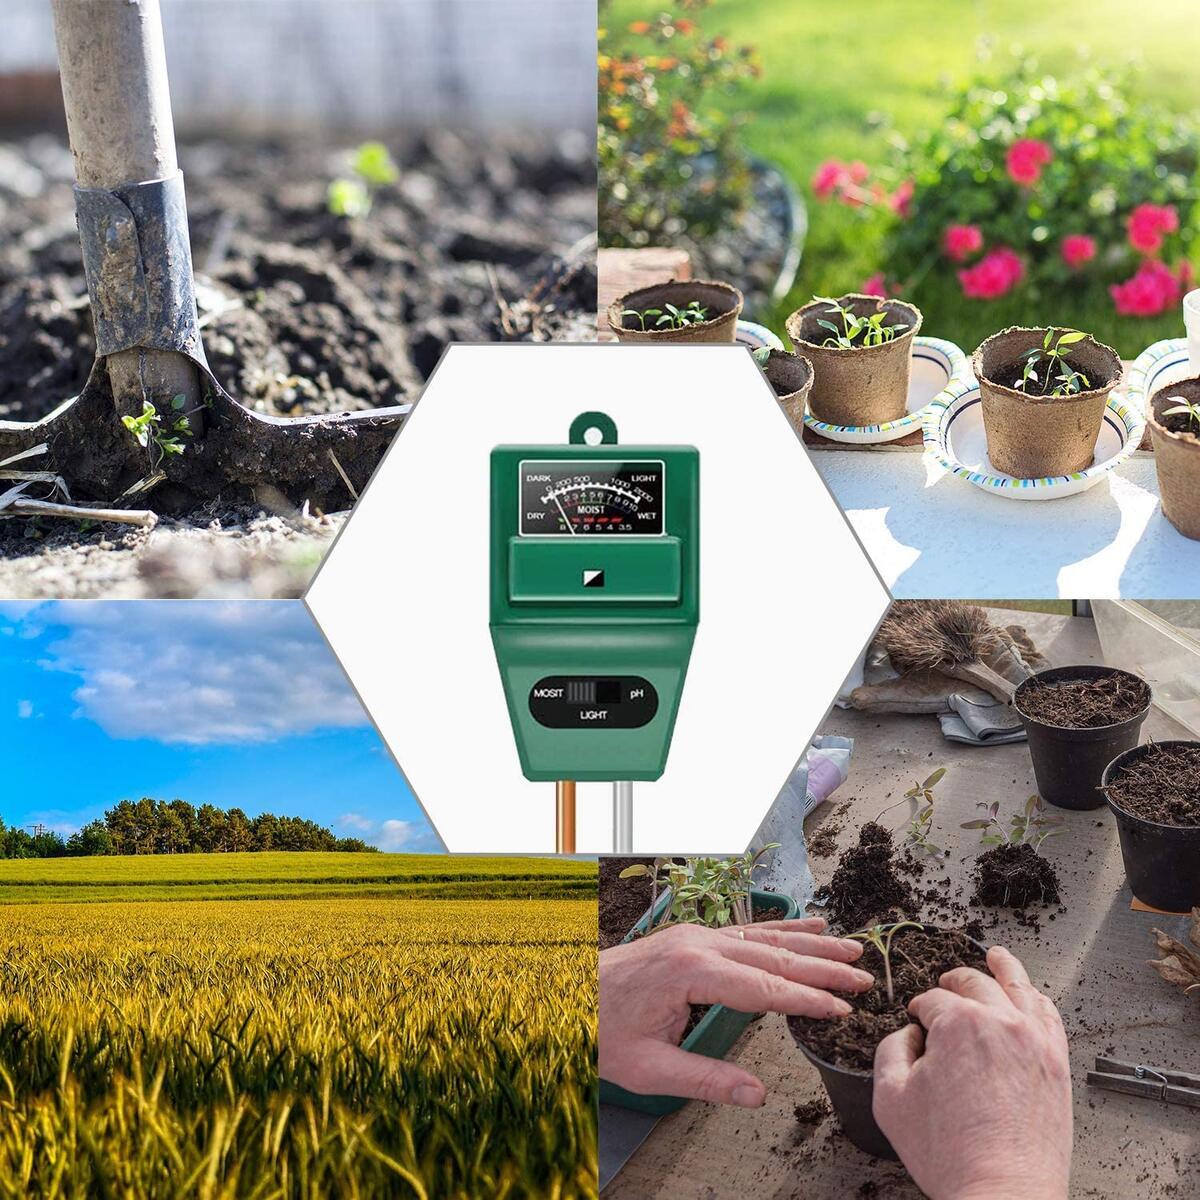 Axwcon Soil pH Meter, 3-in-1 Soil Test Kit Moisture/Light/pH Tester Great for Gardening, Farming, Indoor & Outdoor (No Battery Needed)